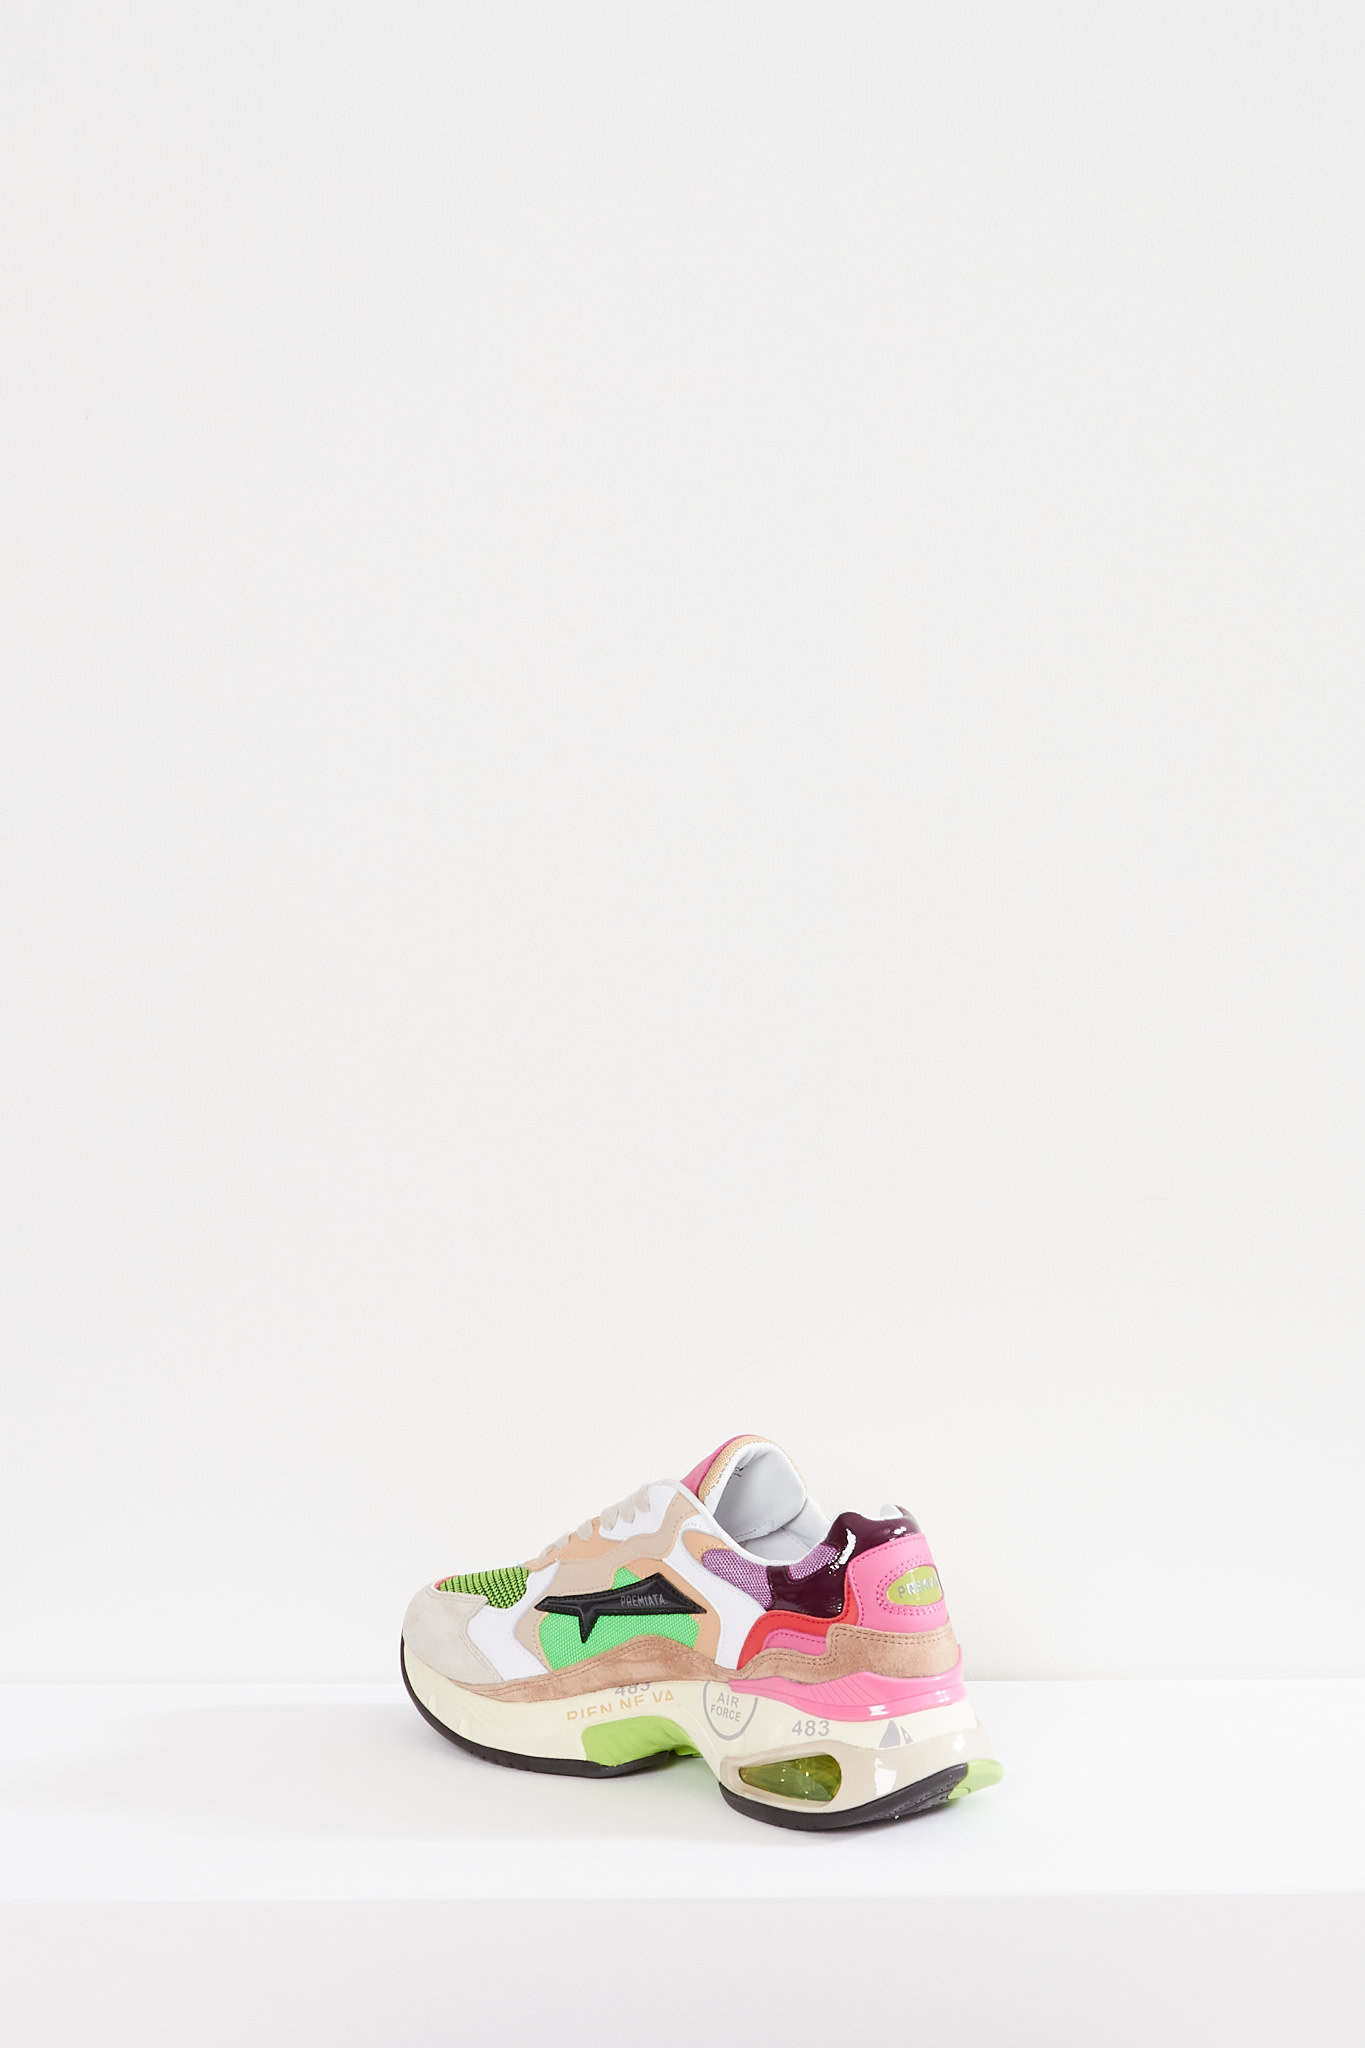 Premiata - Sharky sneaker